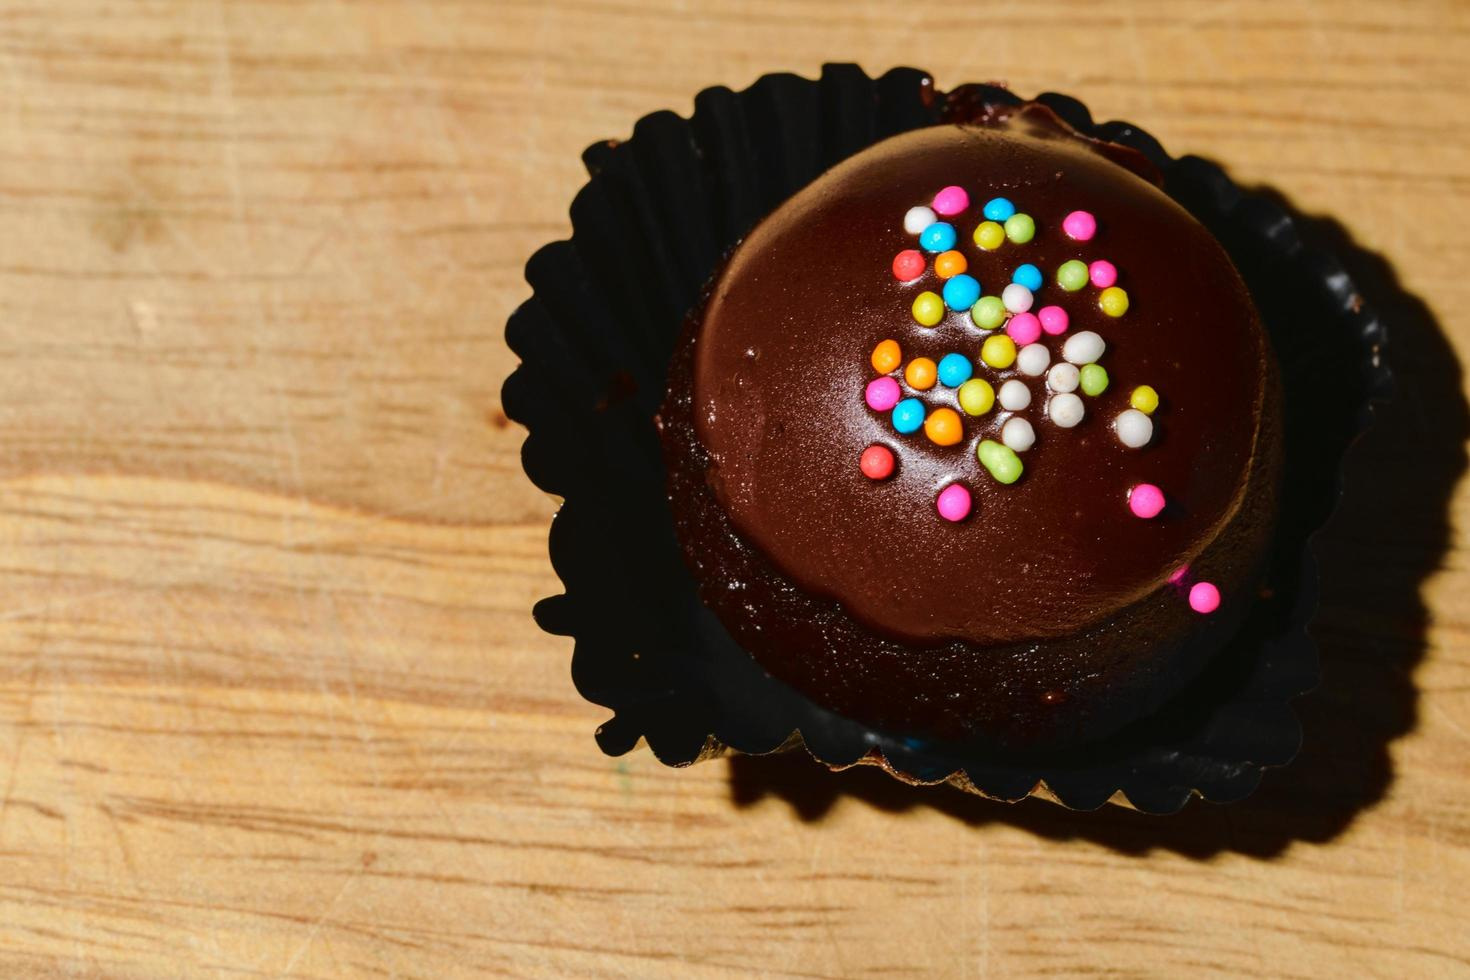 chocolat, tasse, gâteaux, gros plan photo